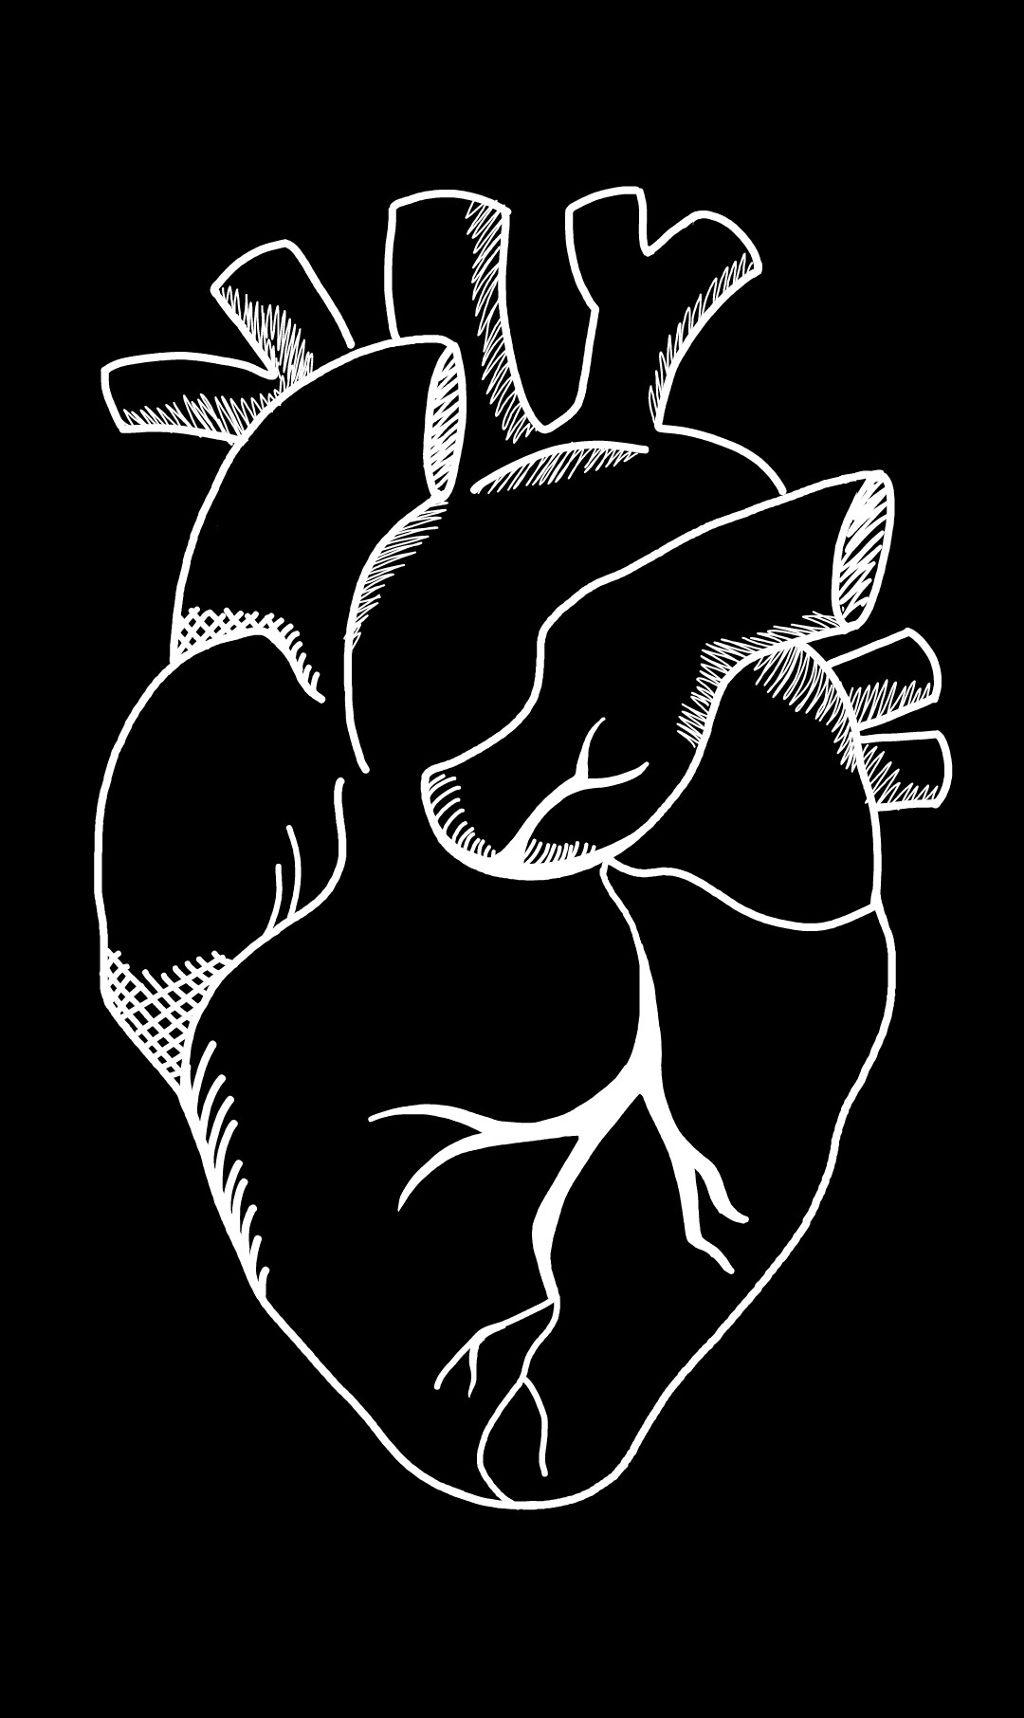 heart minimal simple simplistic minimism cute humanhear